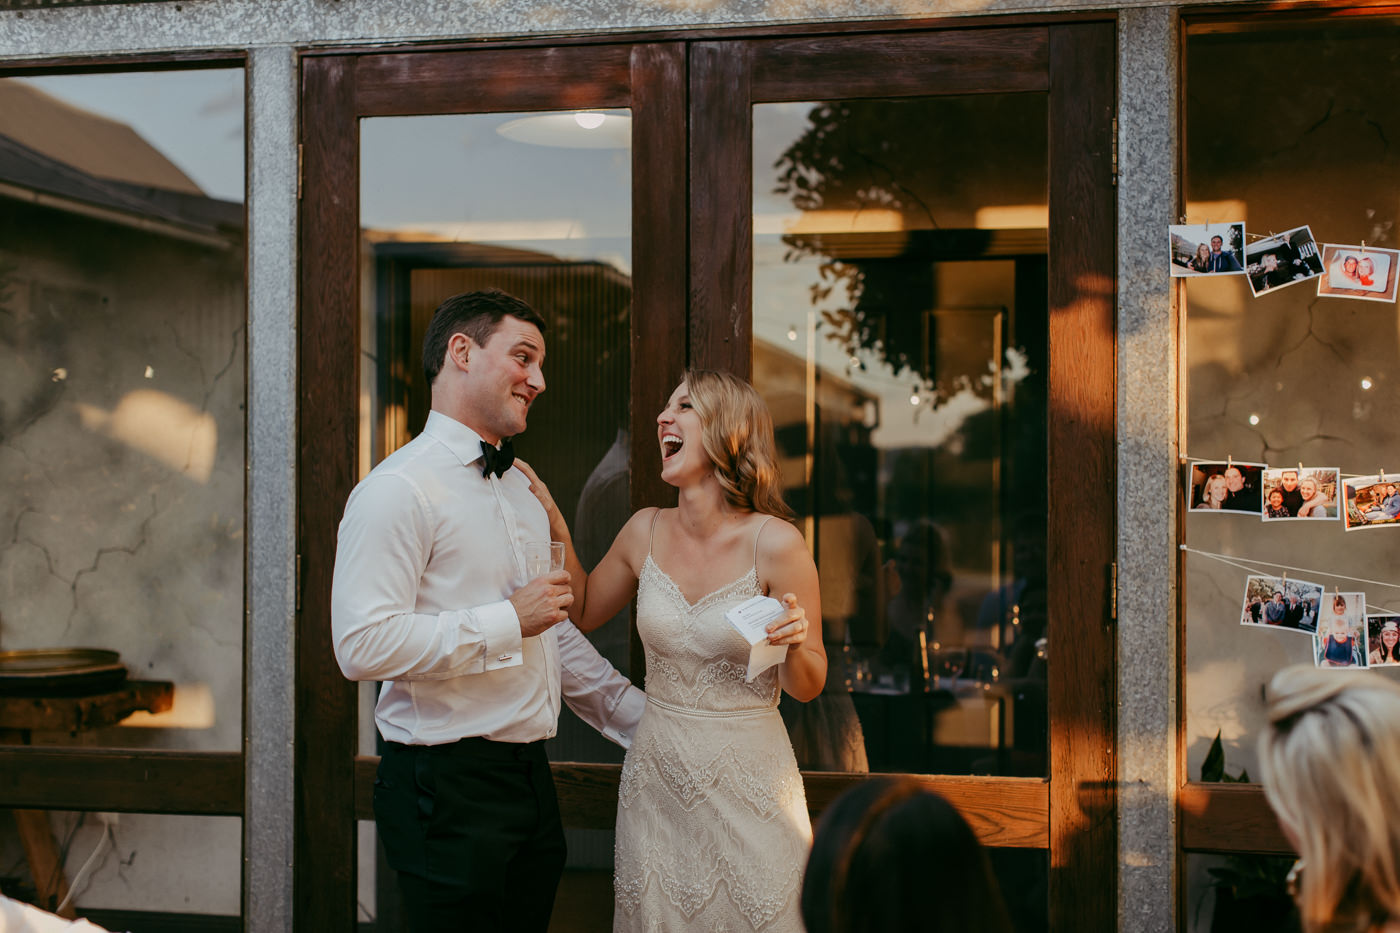 Anthony & Eliet - Wagga Wagga Wedding - Country NSW - Samantha Heather Photography-145.jpg